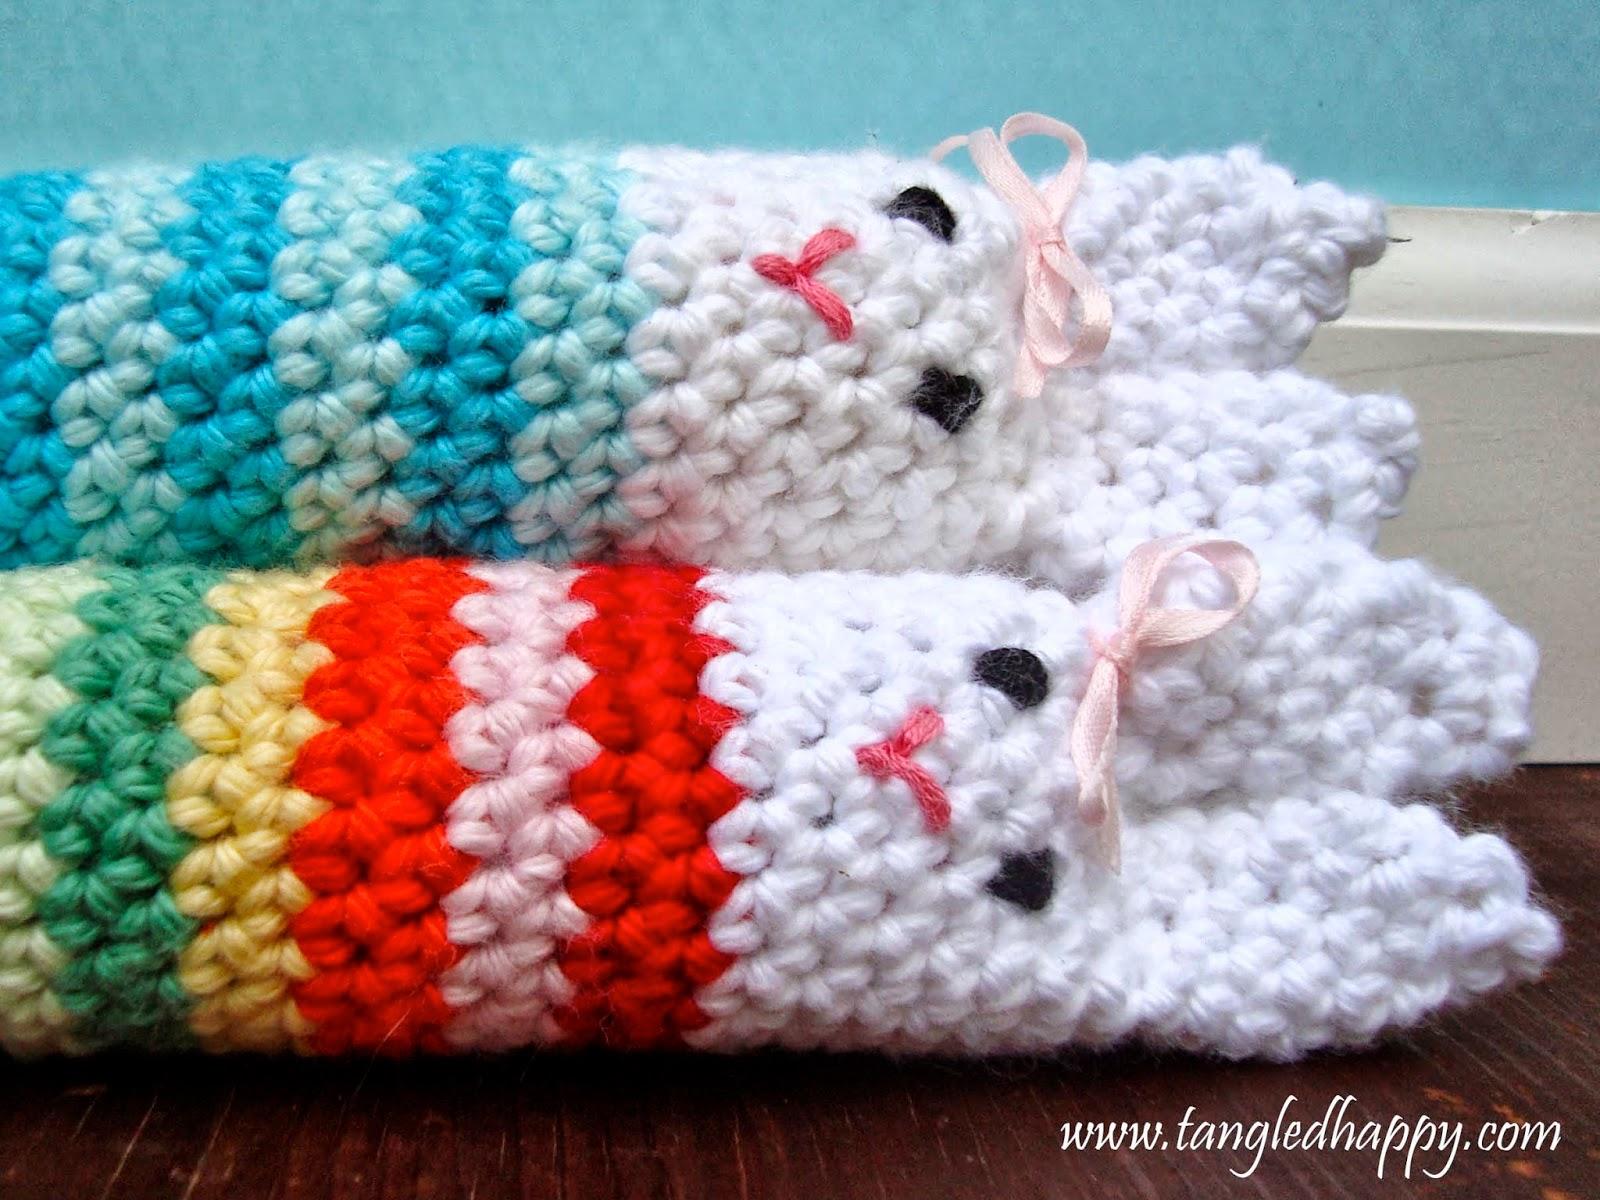 Amigurumi Rattle Free Pattern : Tangled happy how to crochet an easy amigurumi bunny charlotte s